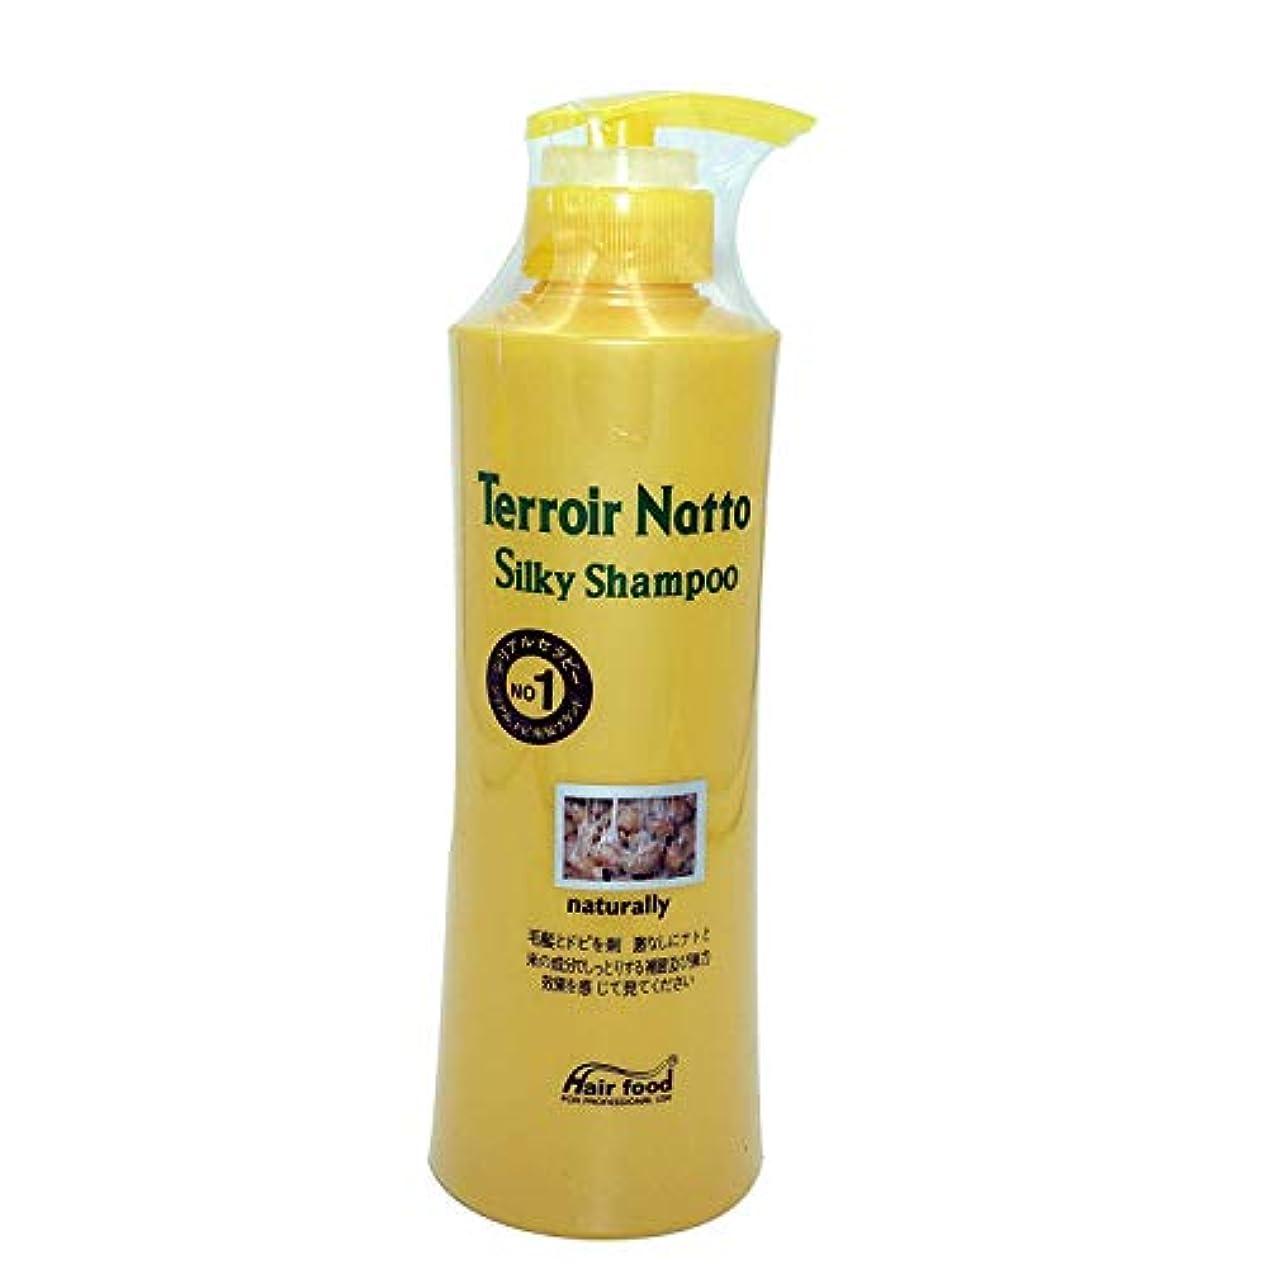 Hair food テロワール納豆シルキーシャンプー500ml、乾燥薄毛とセンシティブな頭皮用 - ビタミンタンパクによる弾力ヘア (Terroir Natto Silky Shampoo 500ml for Dry Thin Hair and Sensitive Scalp - Elastic Hair by Vitamin Protein)[並行輸入品]